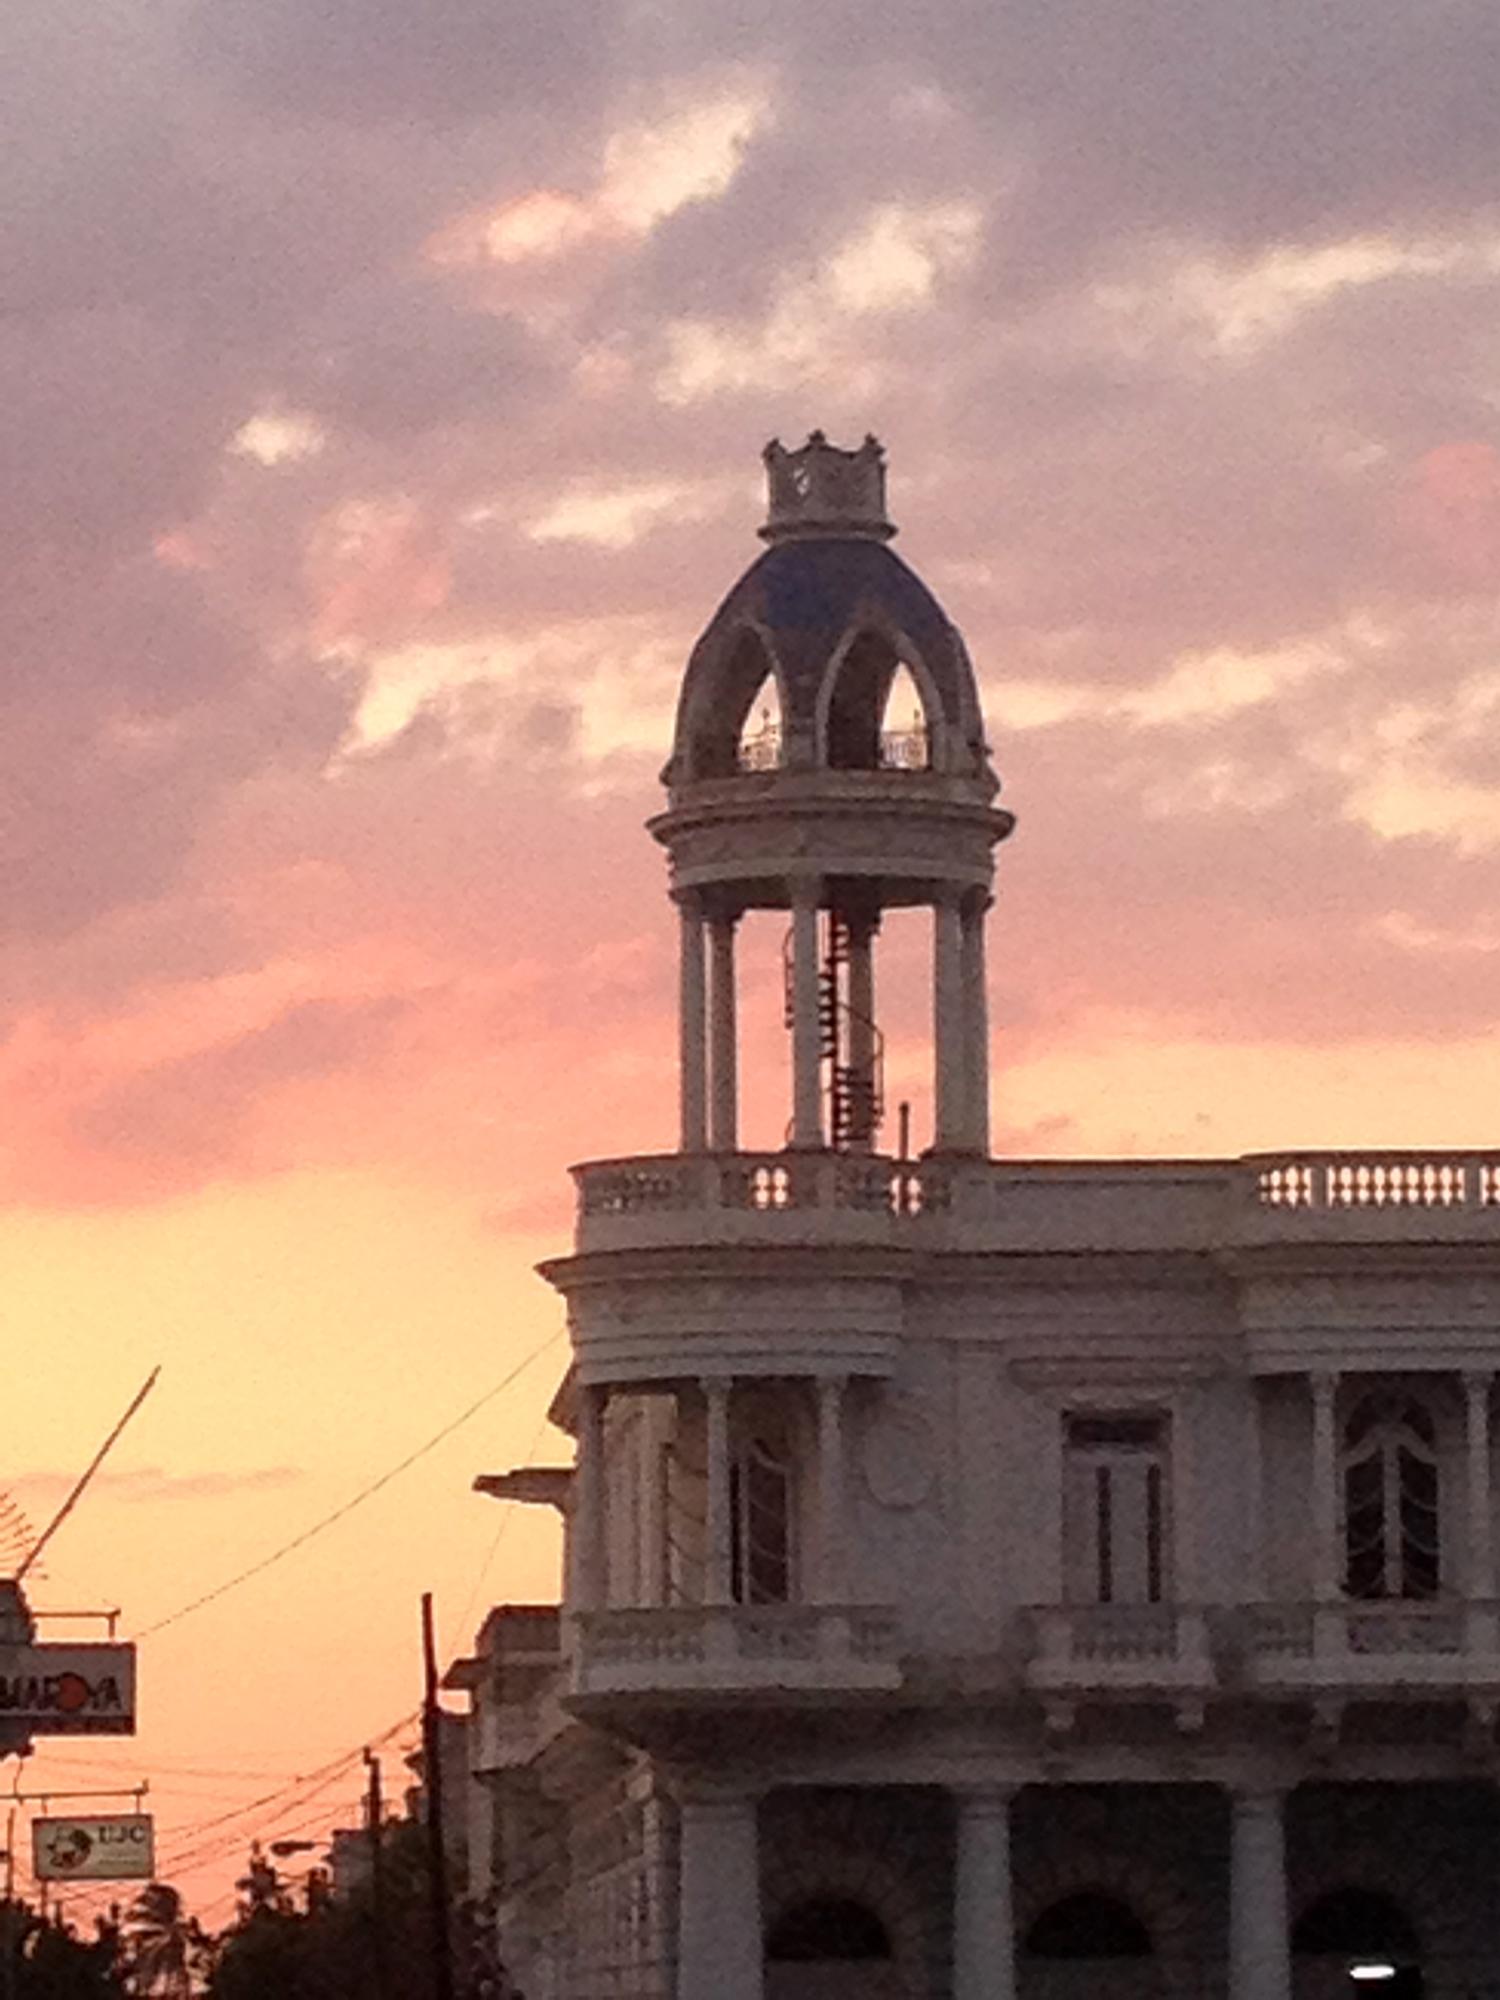 Sunset in Cienfuegos